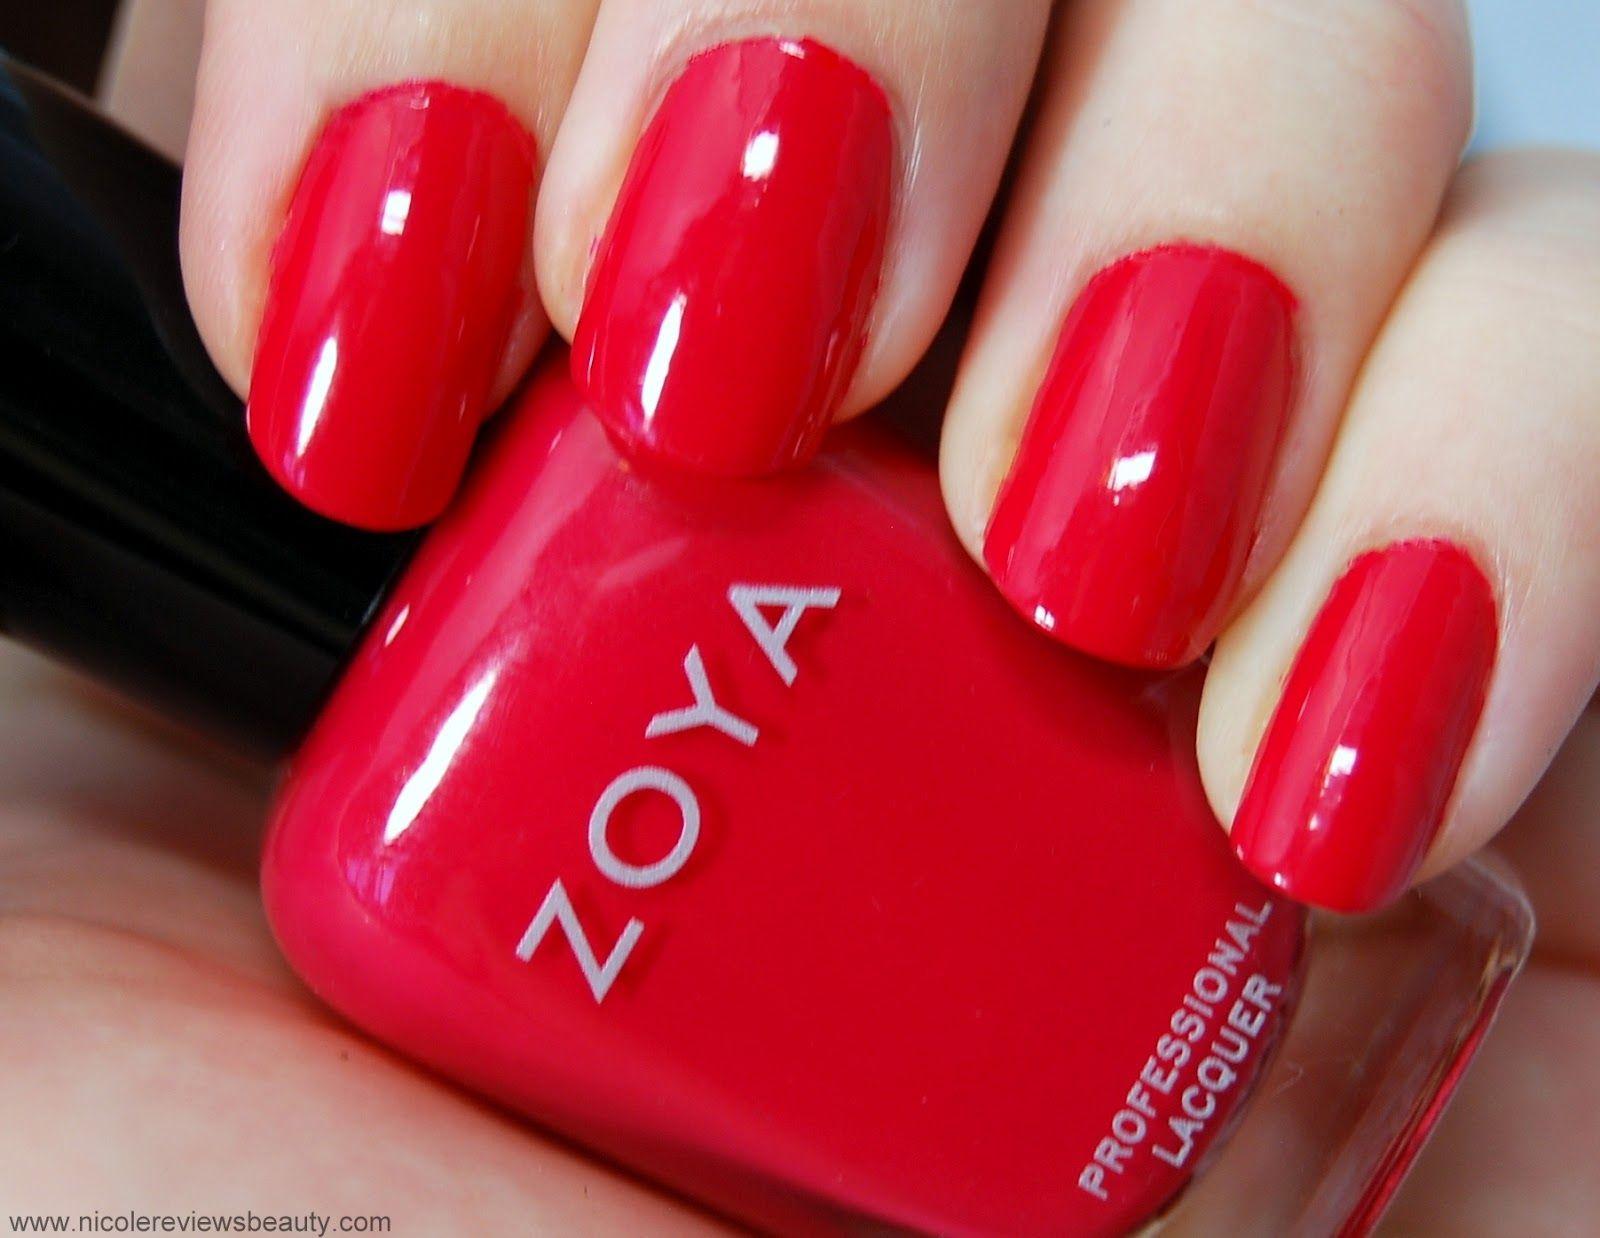 Zoya Nail Polish Shades With Shimmer Brighten Colored Womenitems